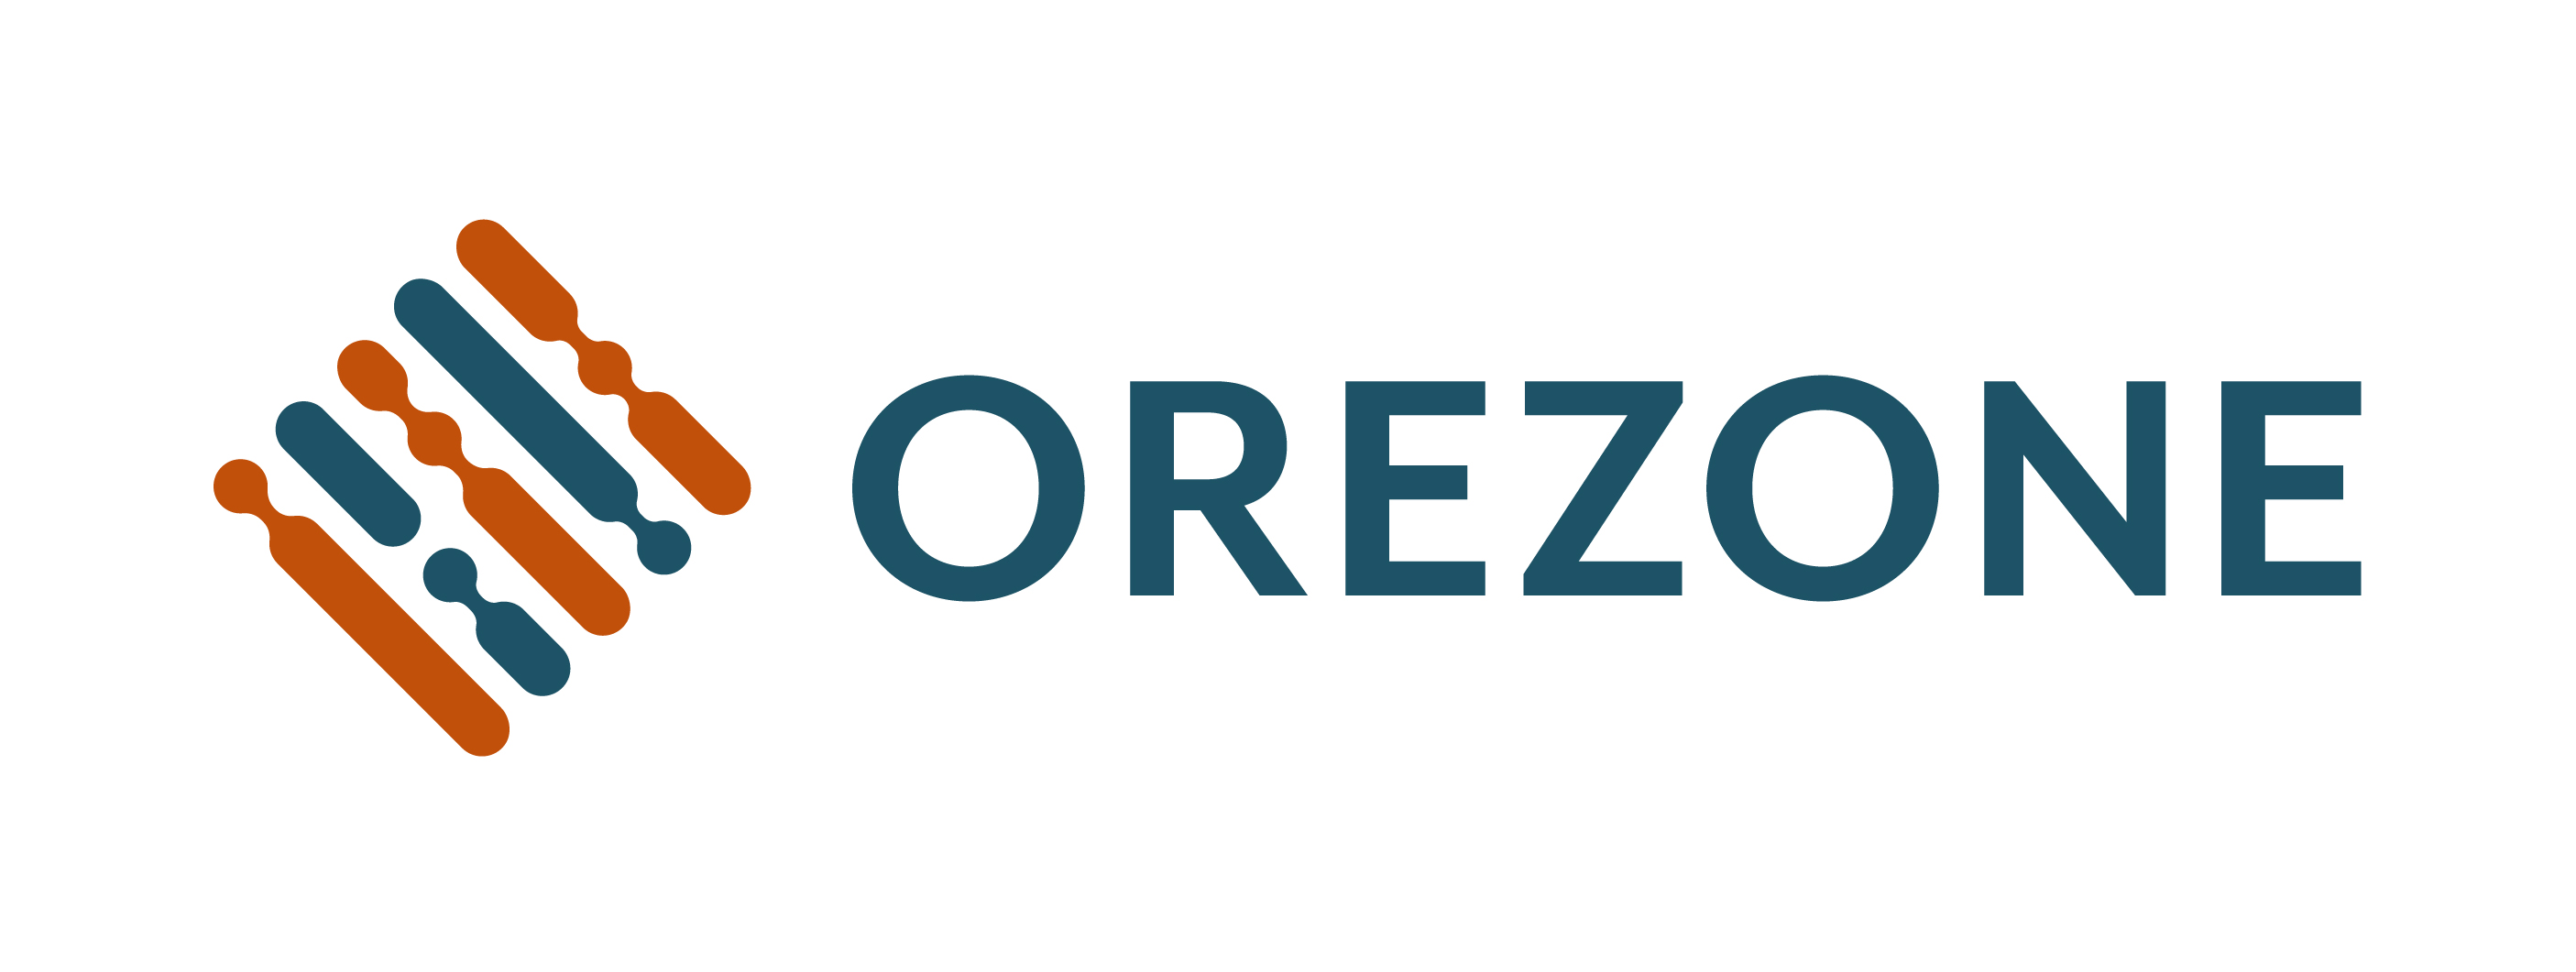 Orezone Provides Bomboré Project Development Update Including Award of Mining Contract